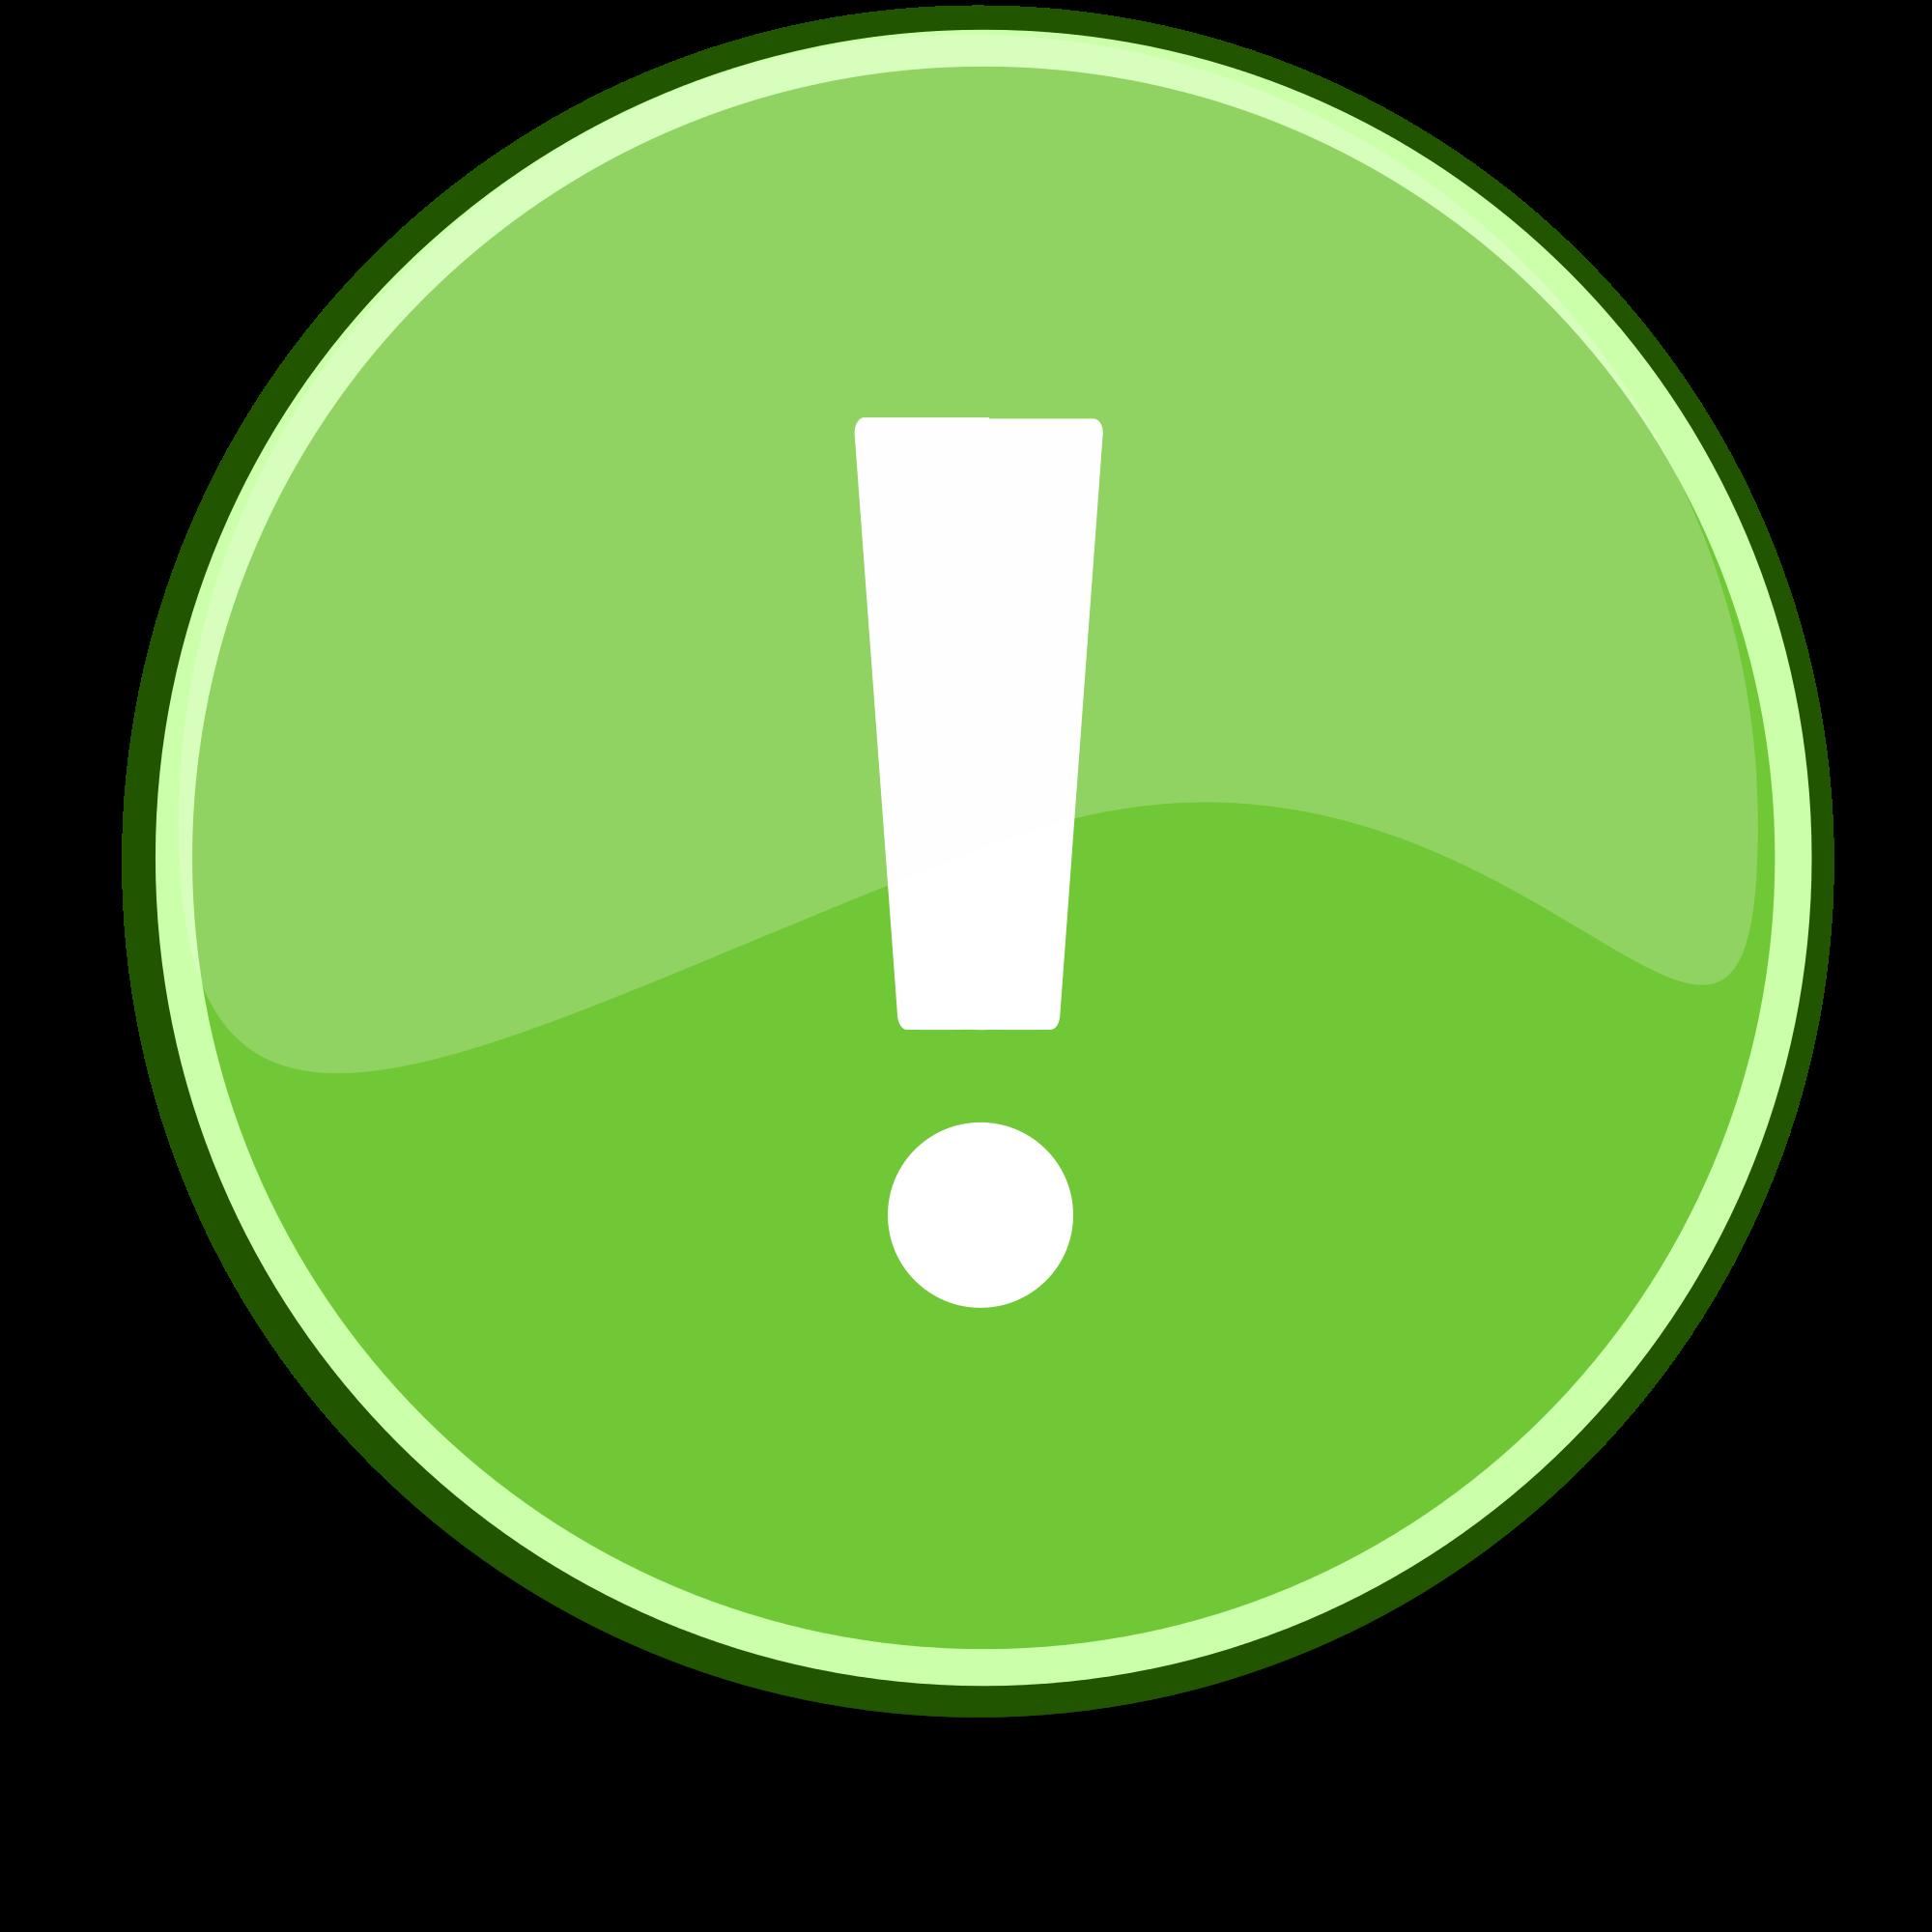 File emblem green svg. Important clipart explanation mark